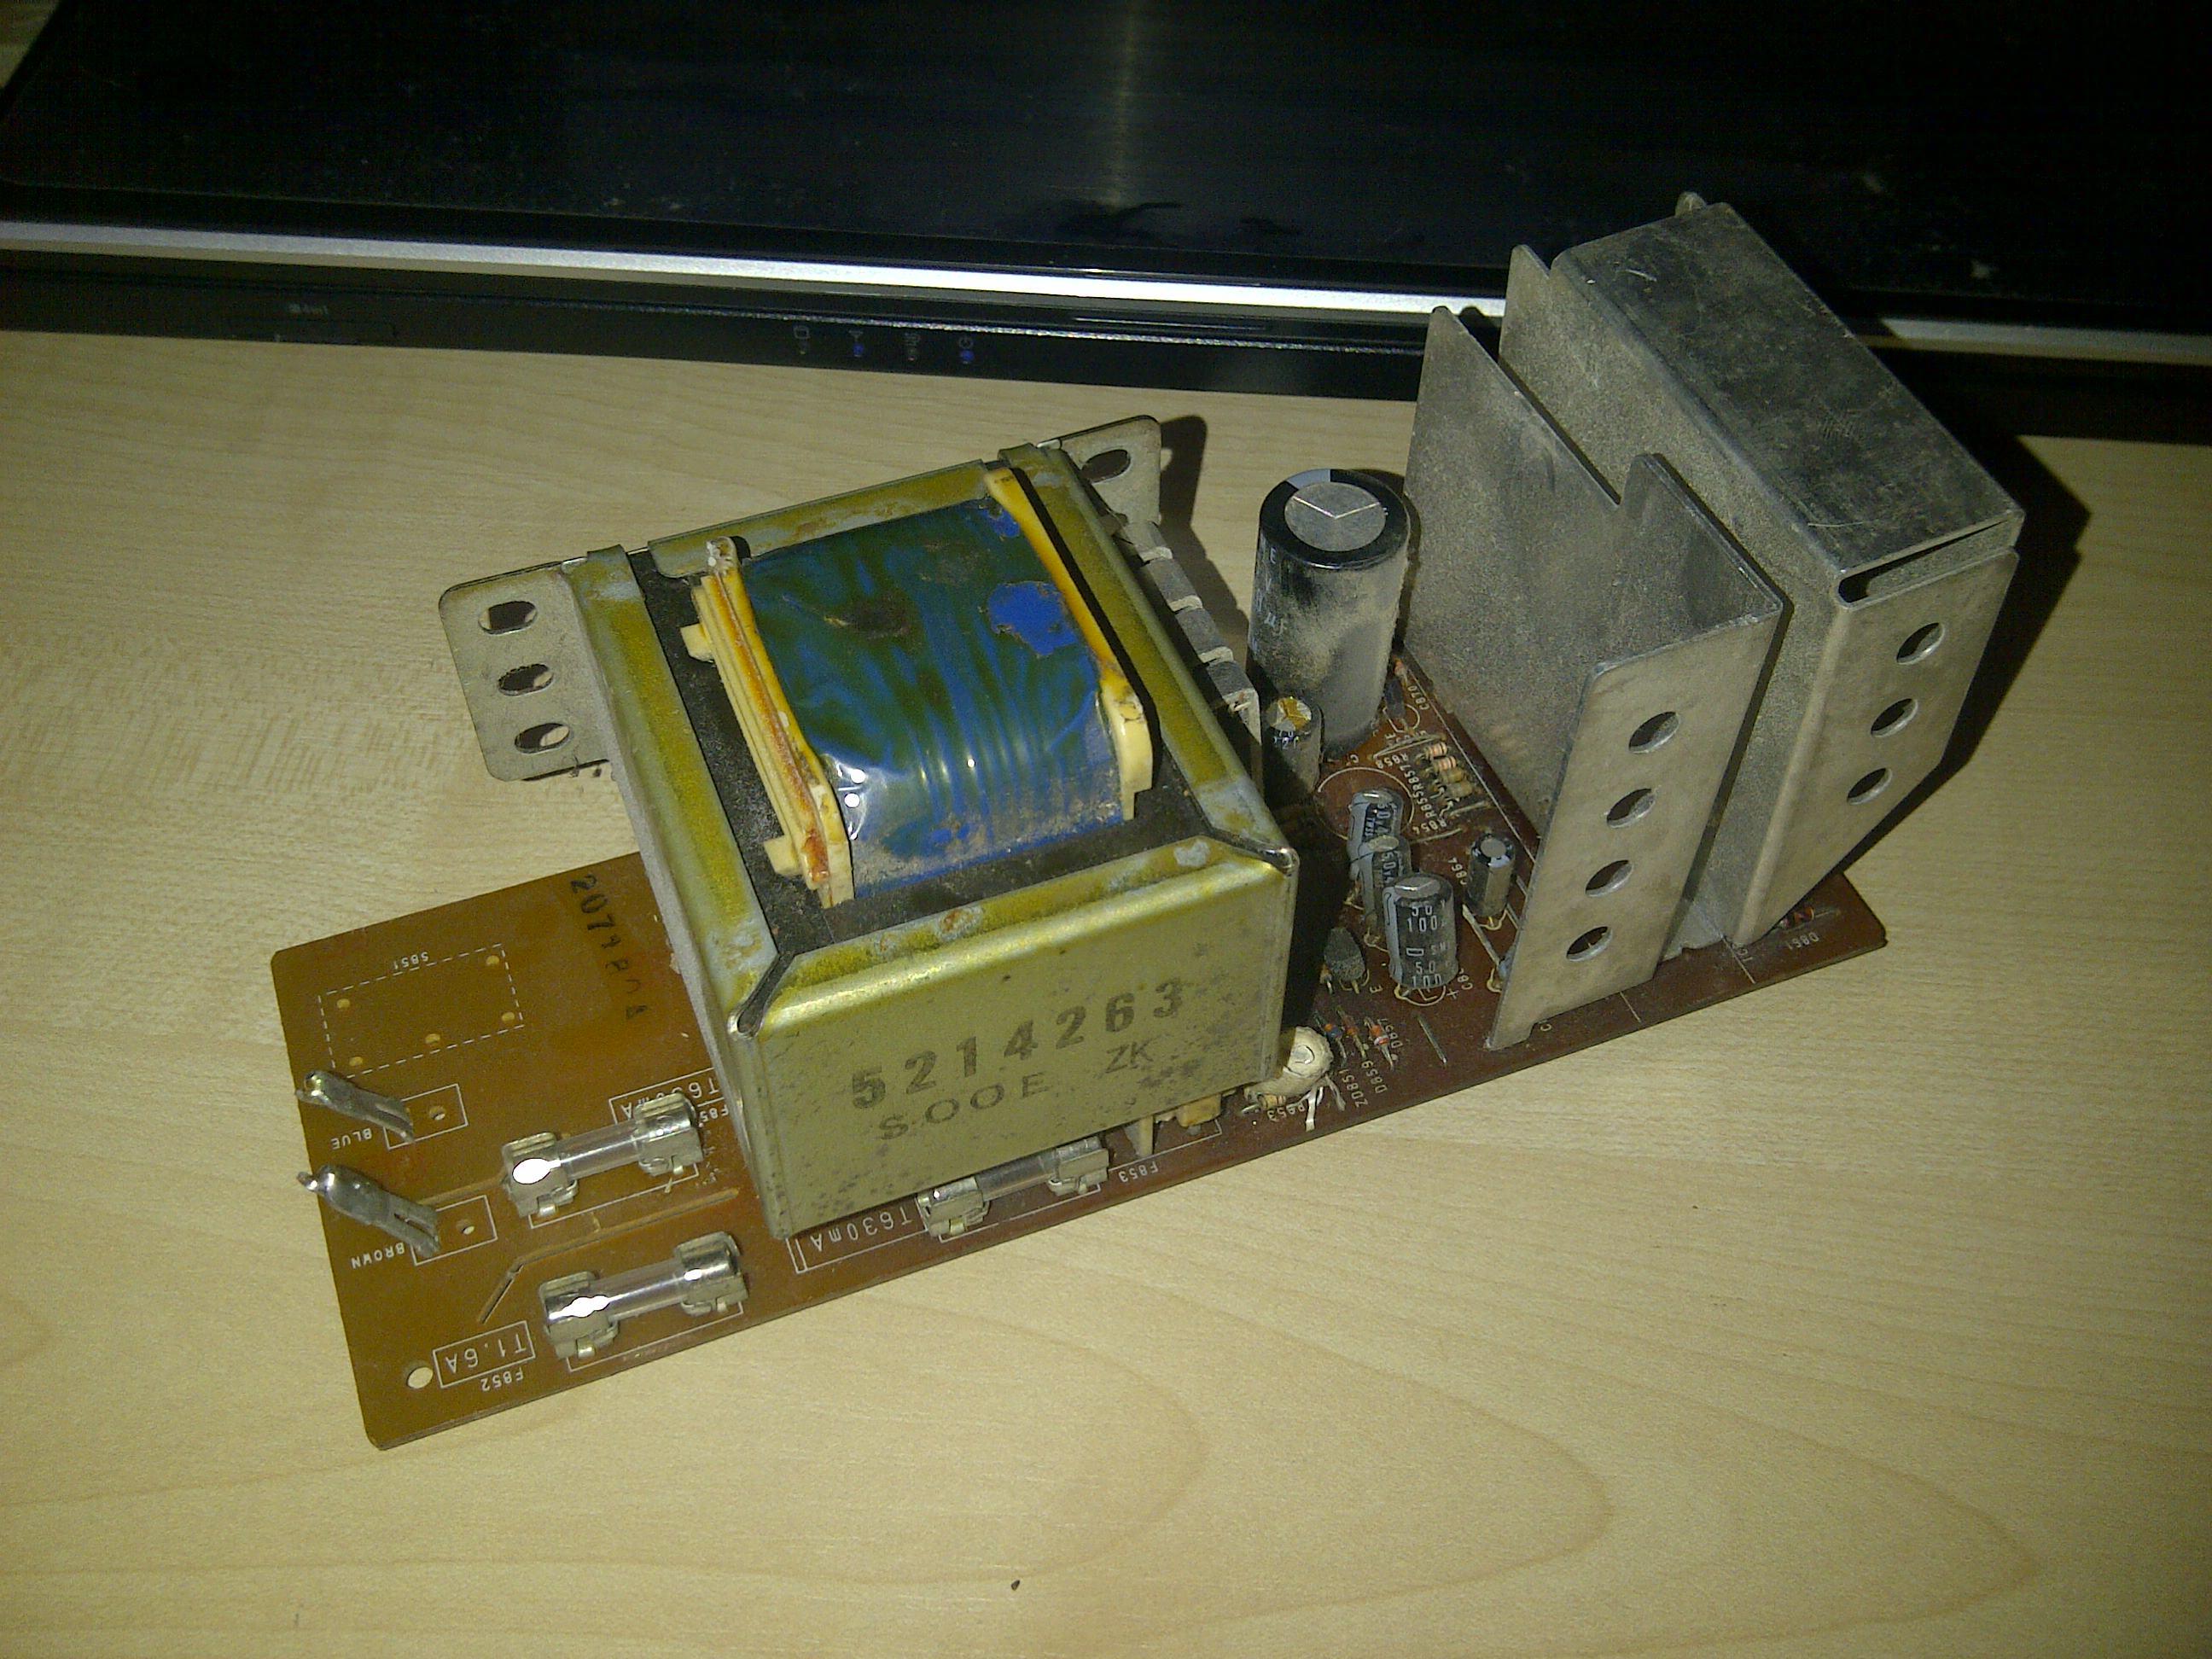 Magnetowid Hitachi - Identyfikacja zasilacza z magnetowidu Hitachi